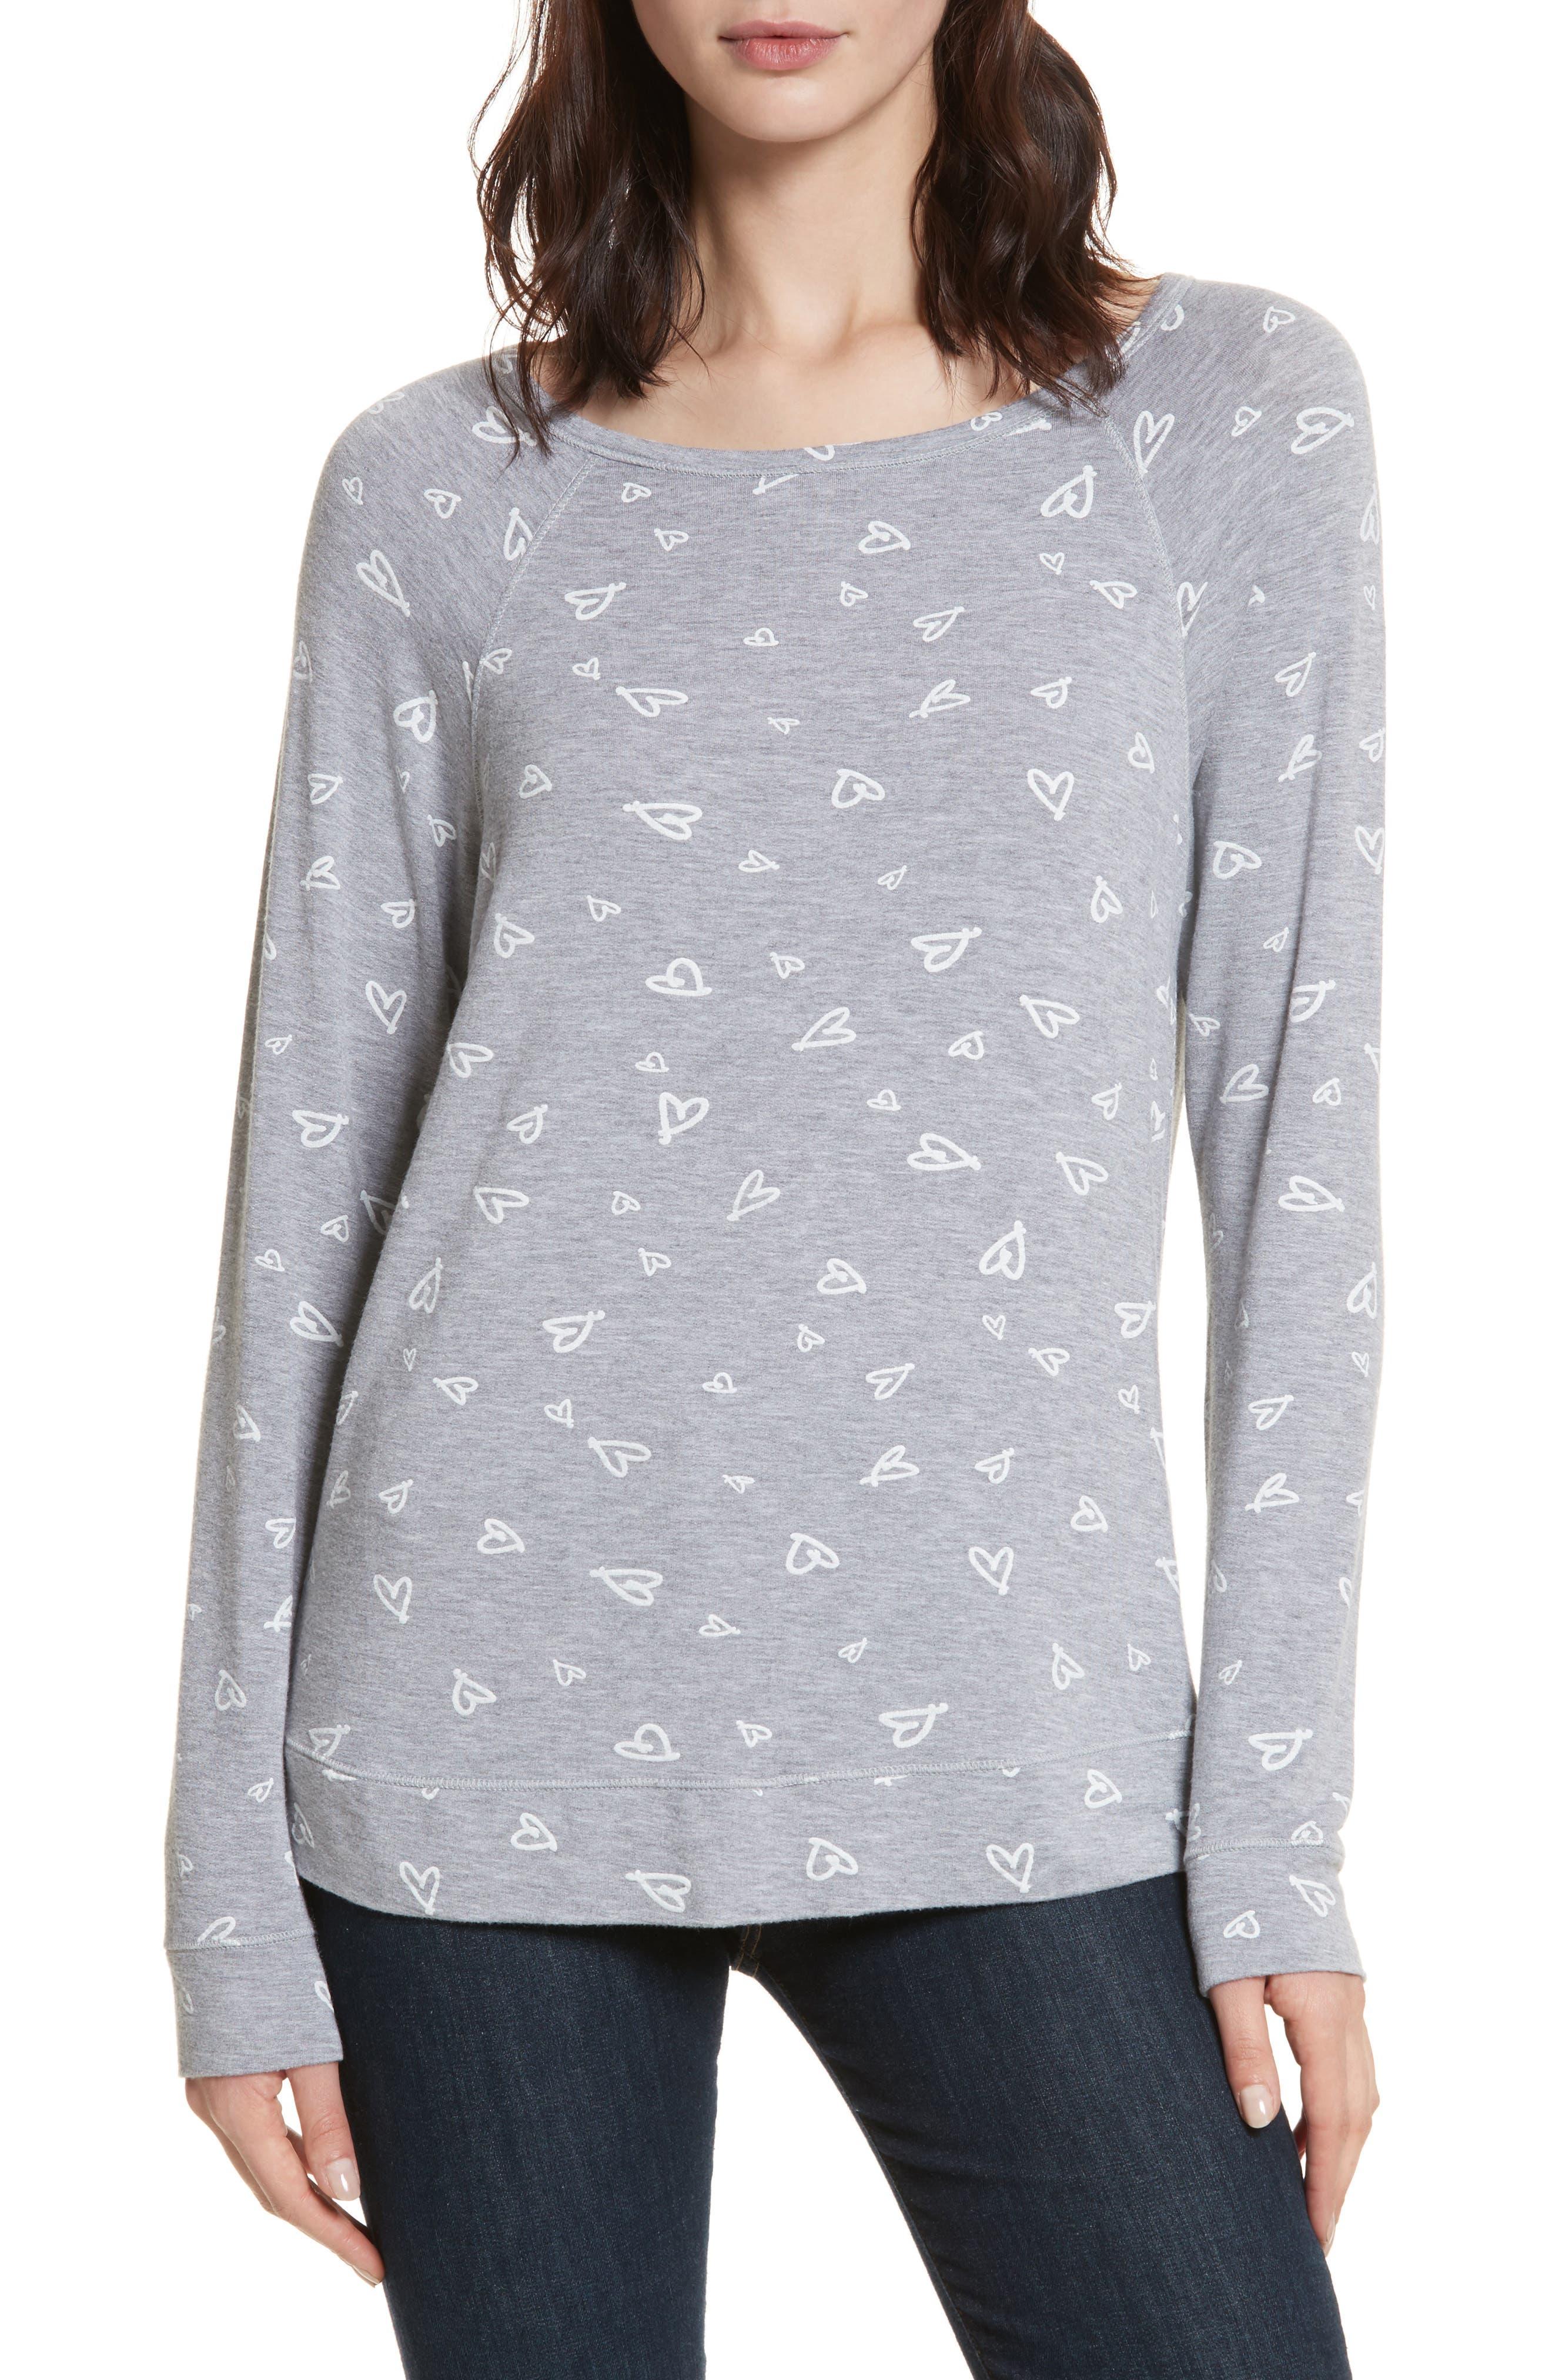 Annora B Print Cotton & Modal Blend Sweatshirt,                         Main,                         color, Heather Grey/ Porcelain